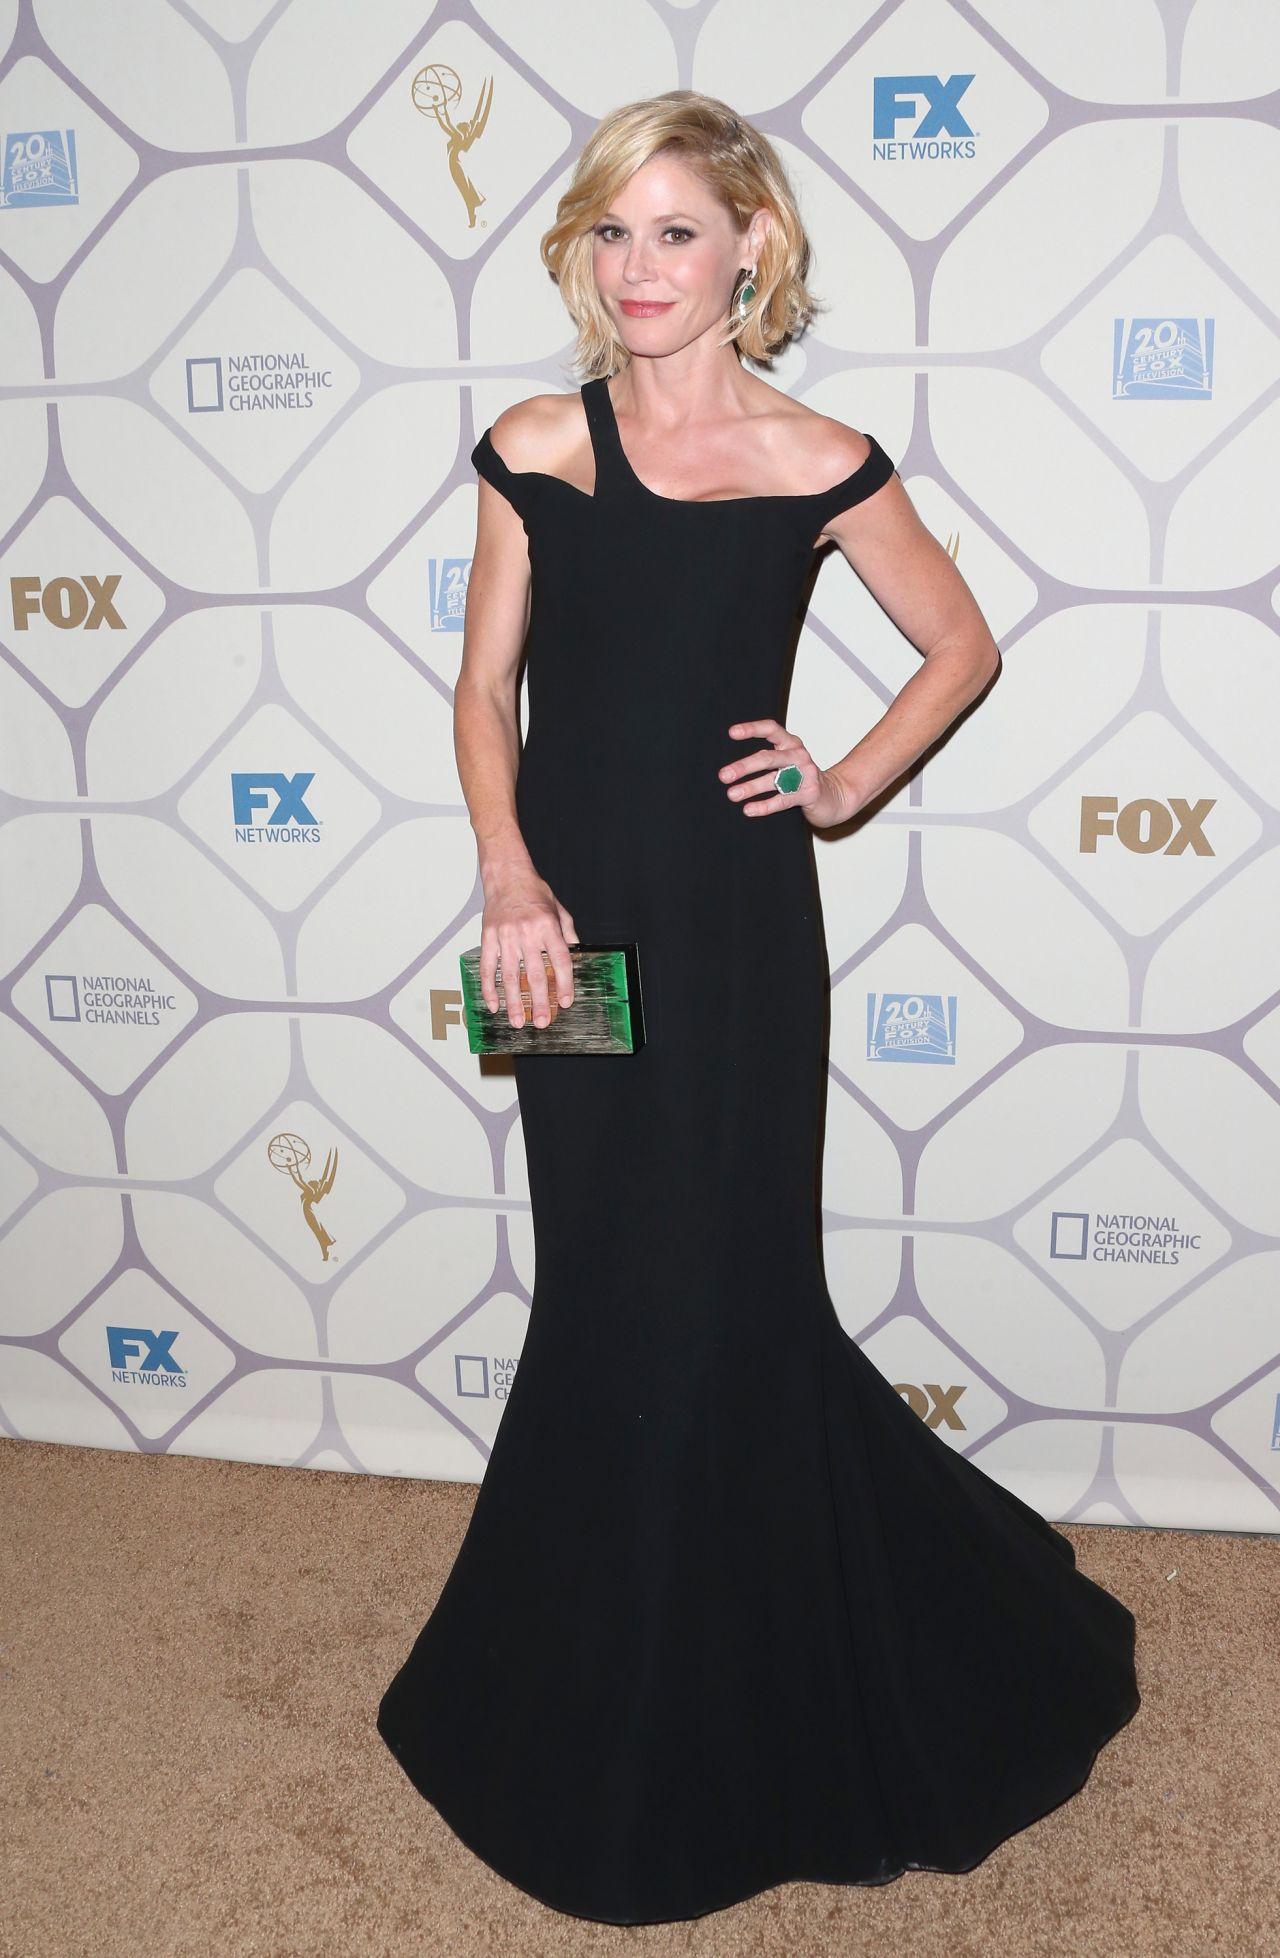 Julie Bowen – 2015 Primetime Emmy Awards Fox After Party in Los Angeles